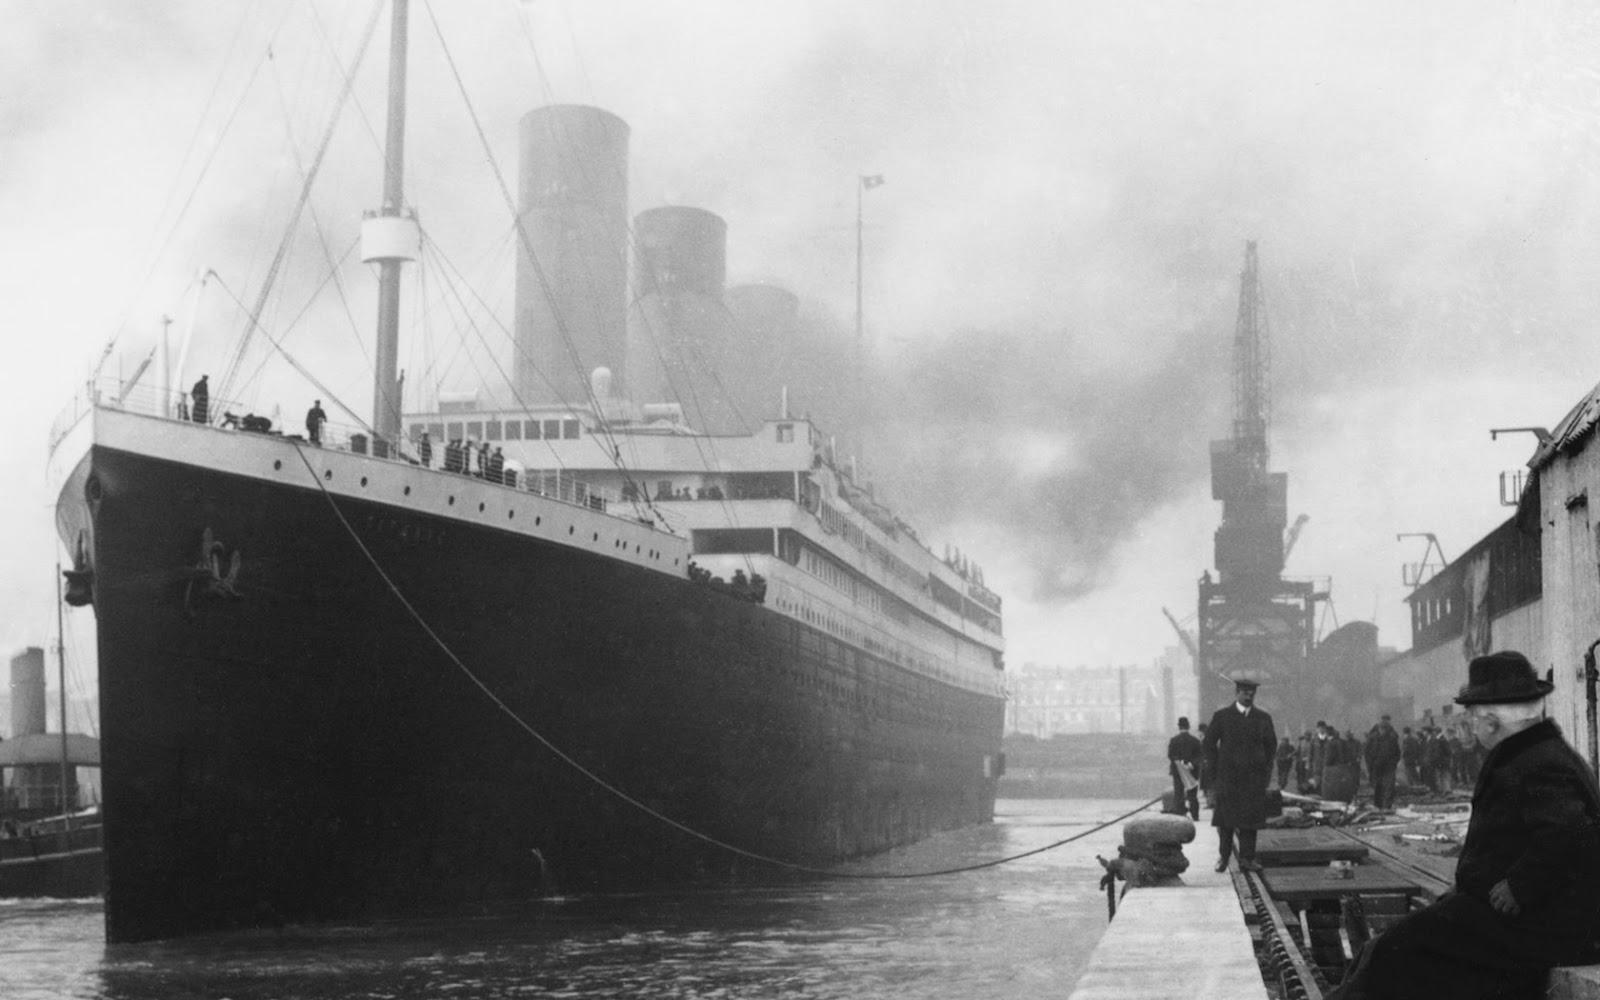 http://2.bp.blogspot.com/-L5w69dDm1o4/T5Gs-czMfQI/AAAAAAAAAsk/UeKWXfl5cDU/s1600/Titanic_Wallpaper_by_whatnotdude.jpg